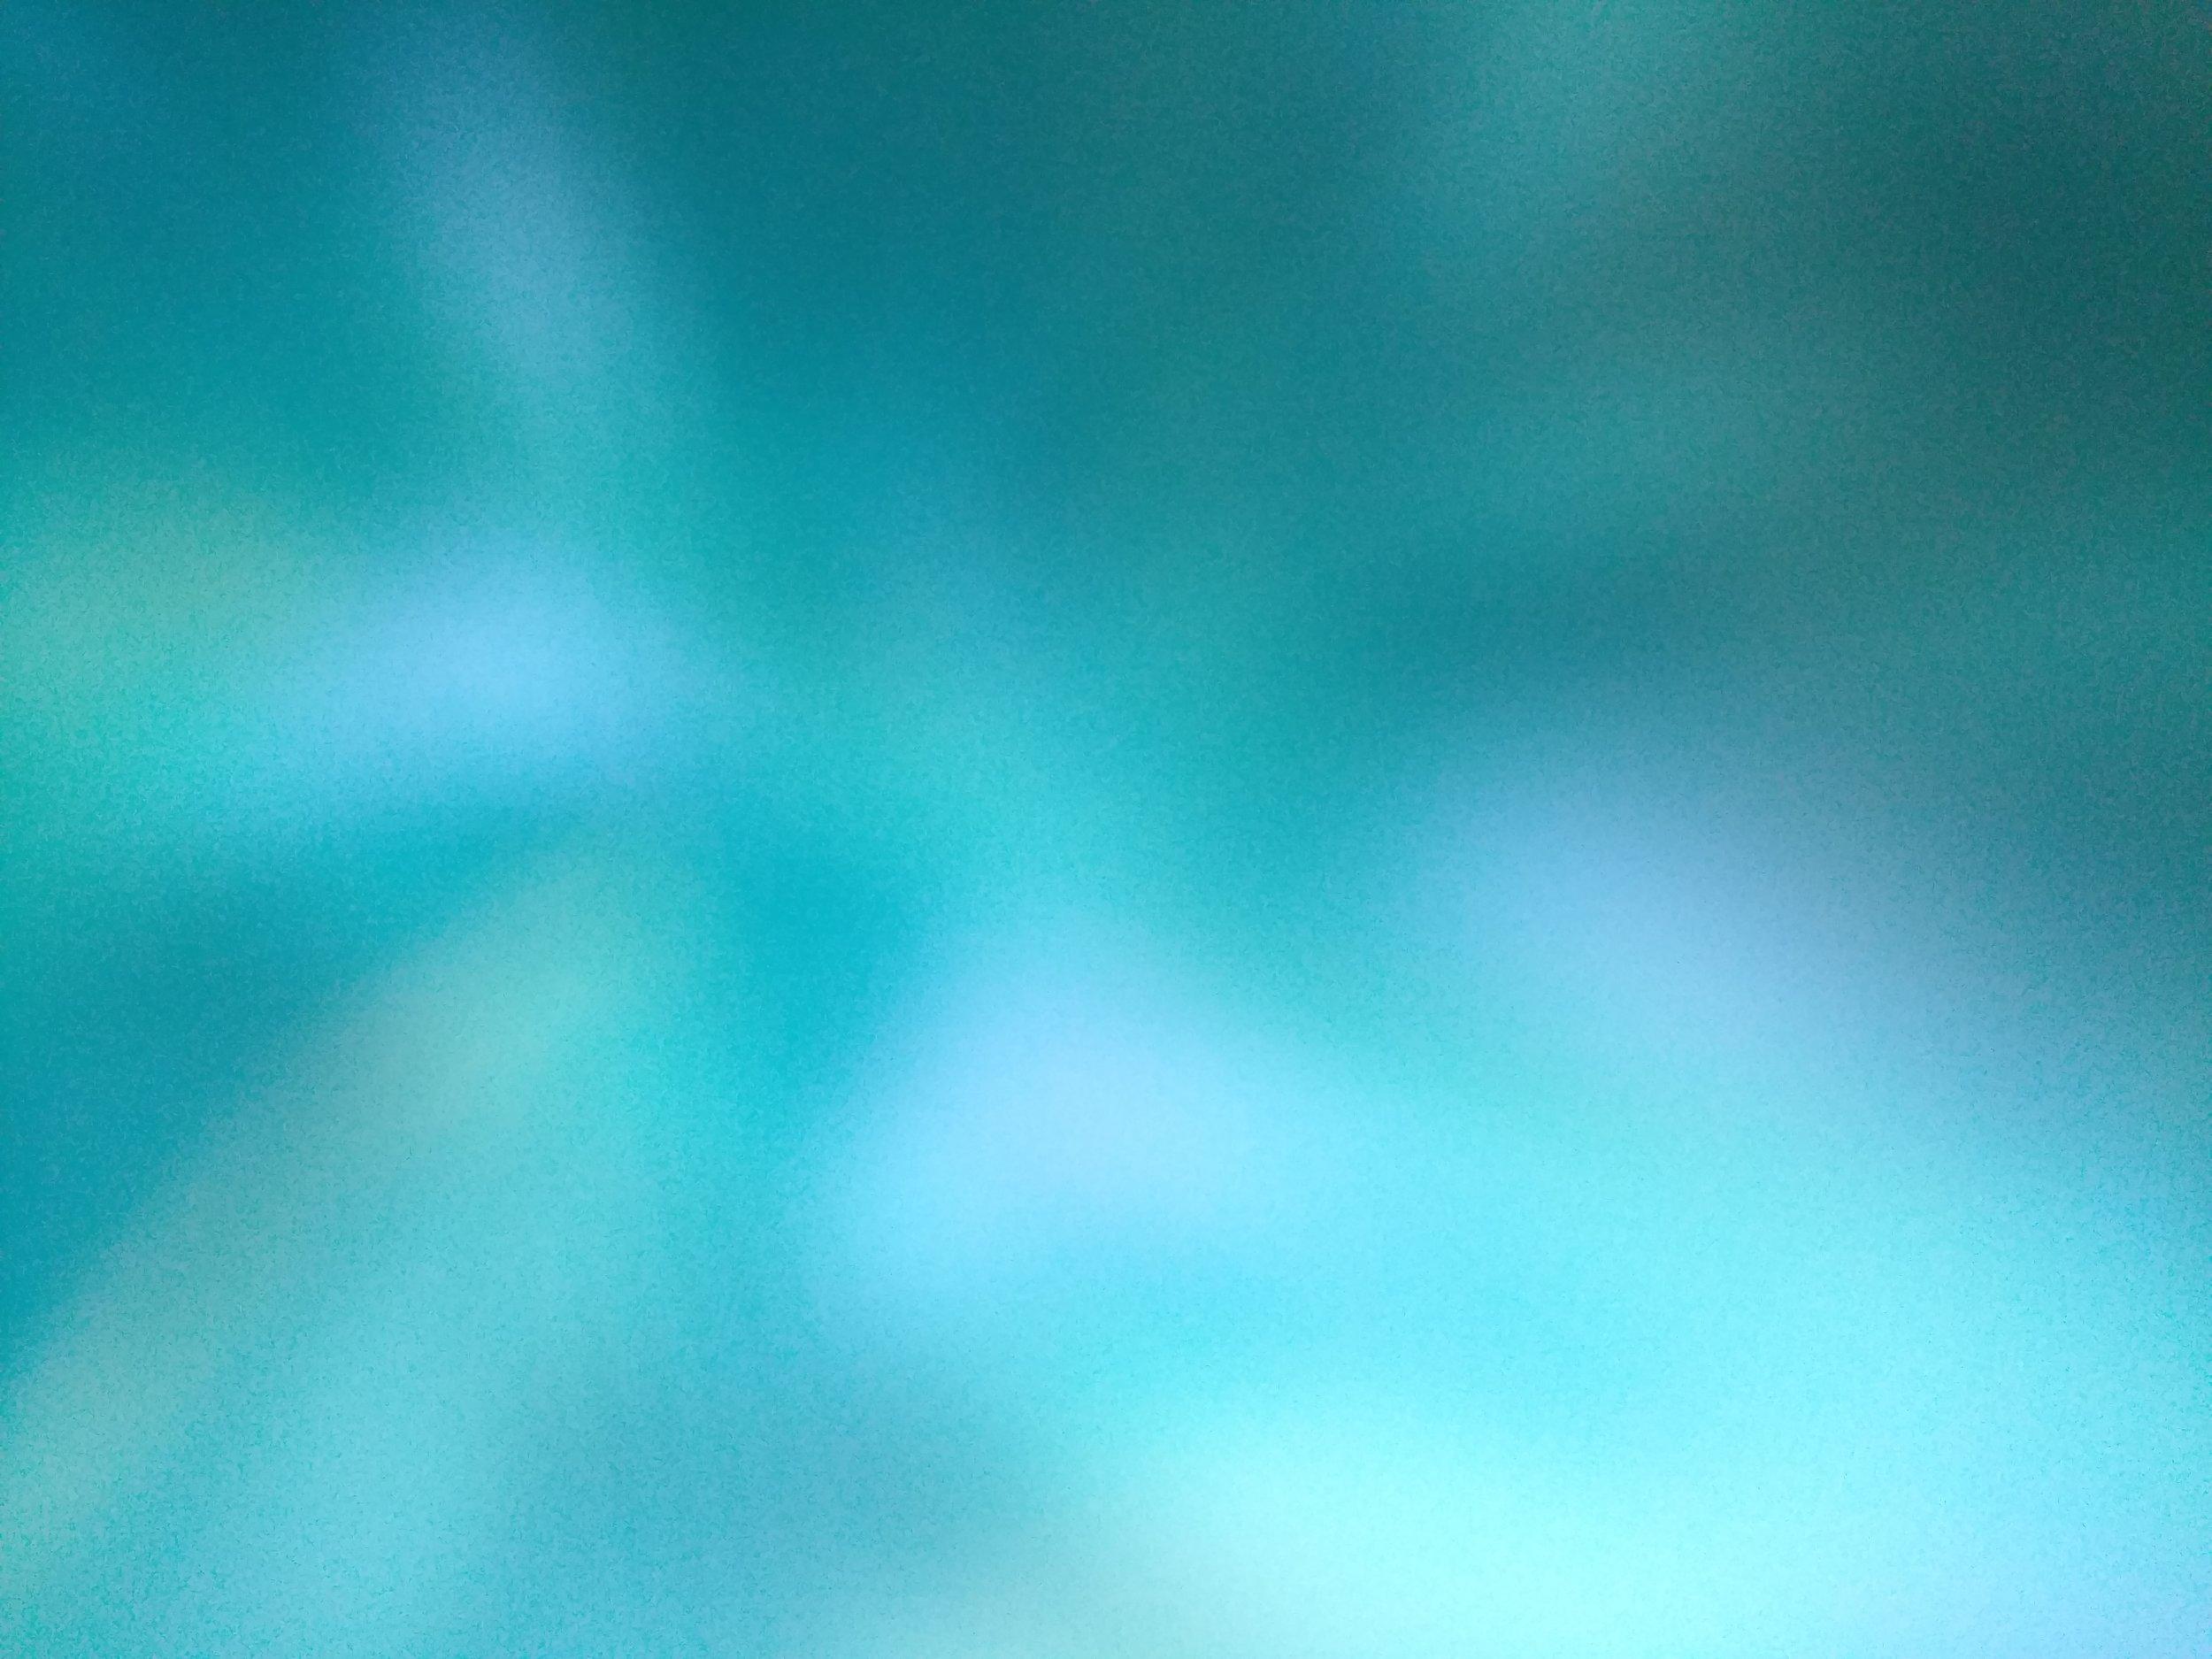 willroth-co-free-texture-gradient-064.jpg